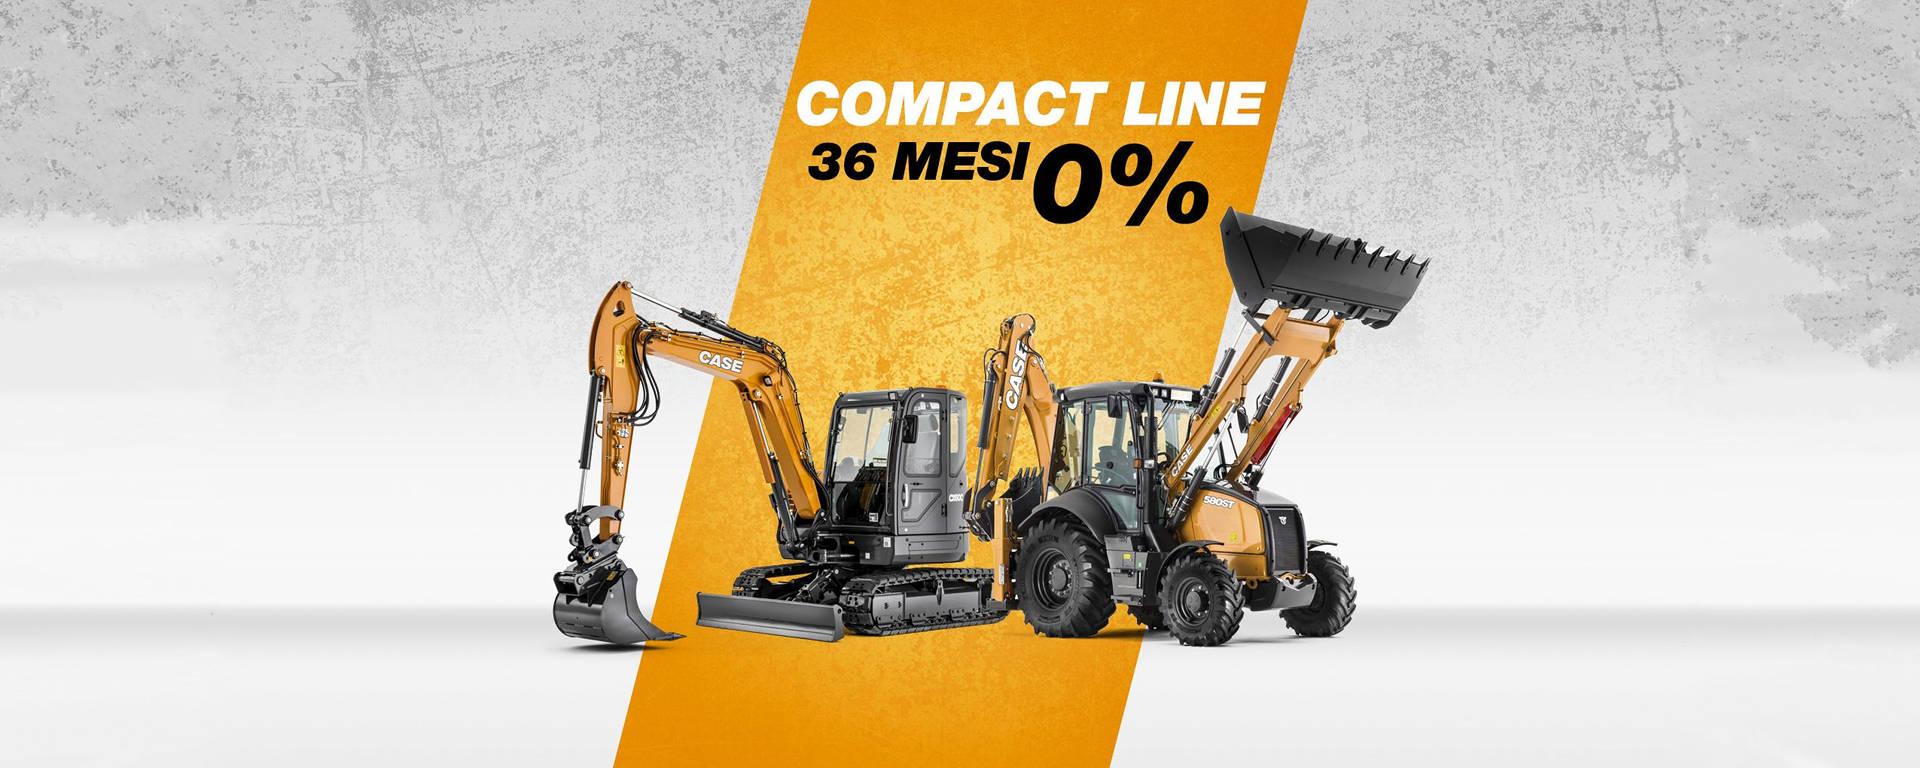 CASE tasso0 compact line